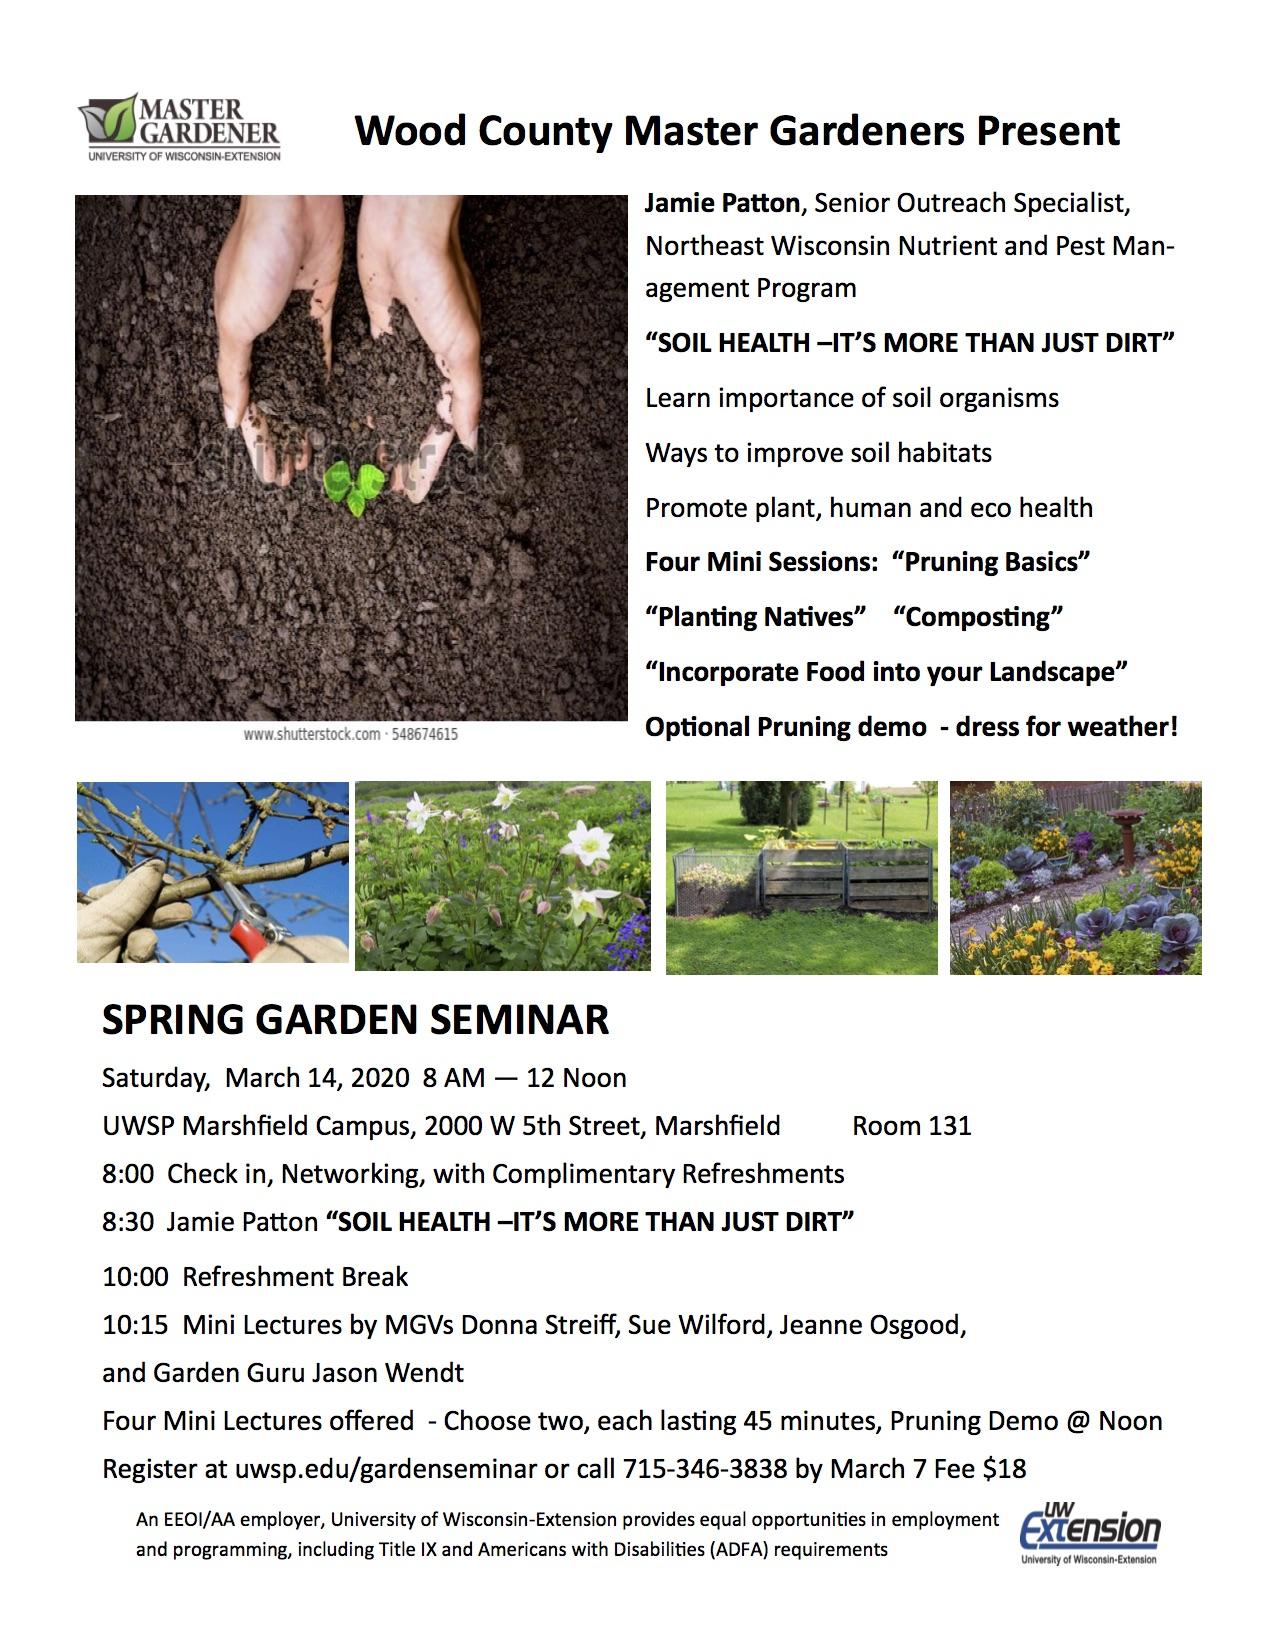 2020 Spring Seminar